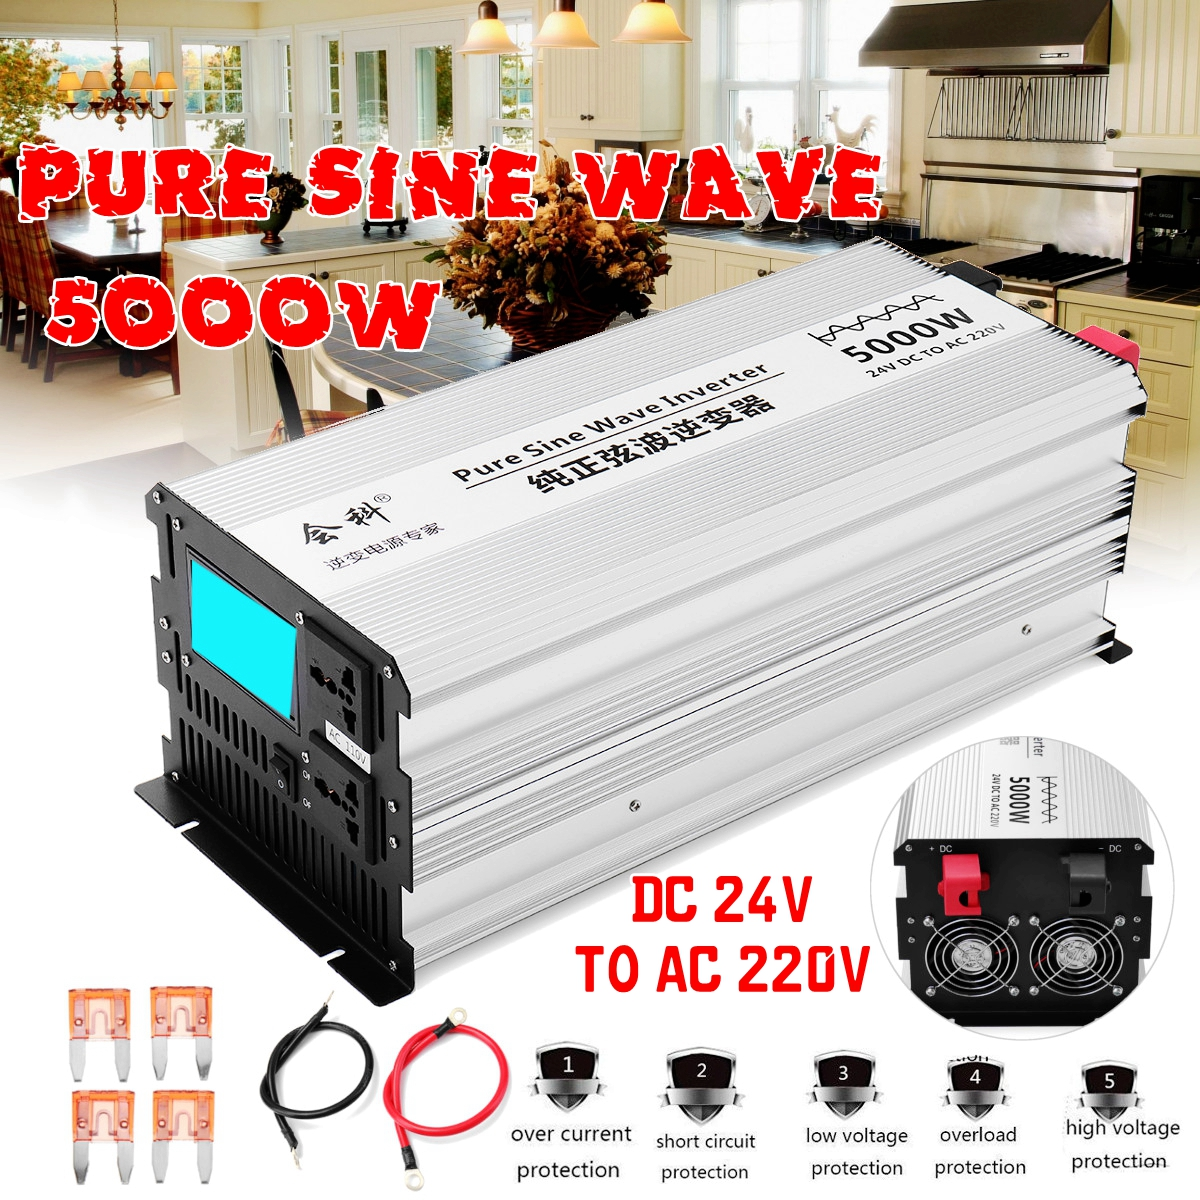 Onduleur onde sinusoïdale pure 2500 W 5000 W Pic 50Hz DC 12 V/24 V/48 V à AC 110 V/220 V transformateur Converte led affichage Onduleur